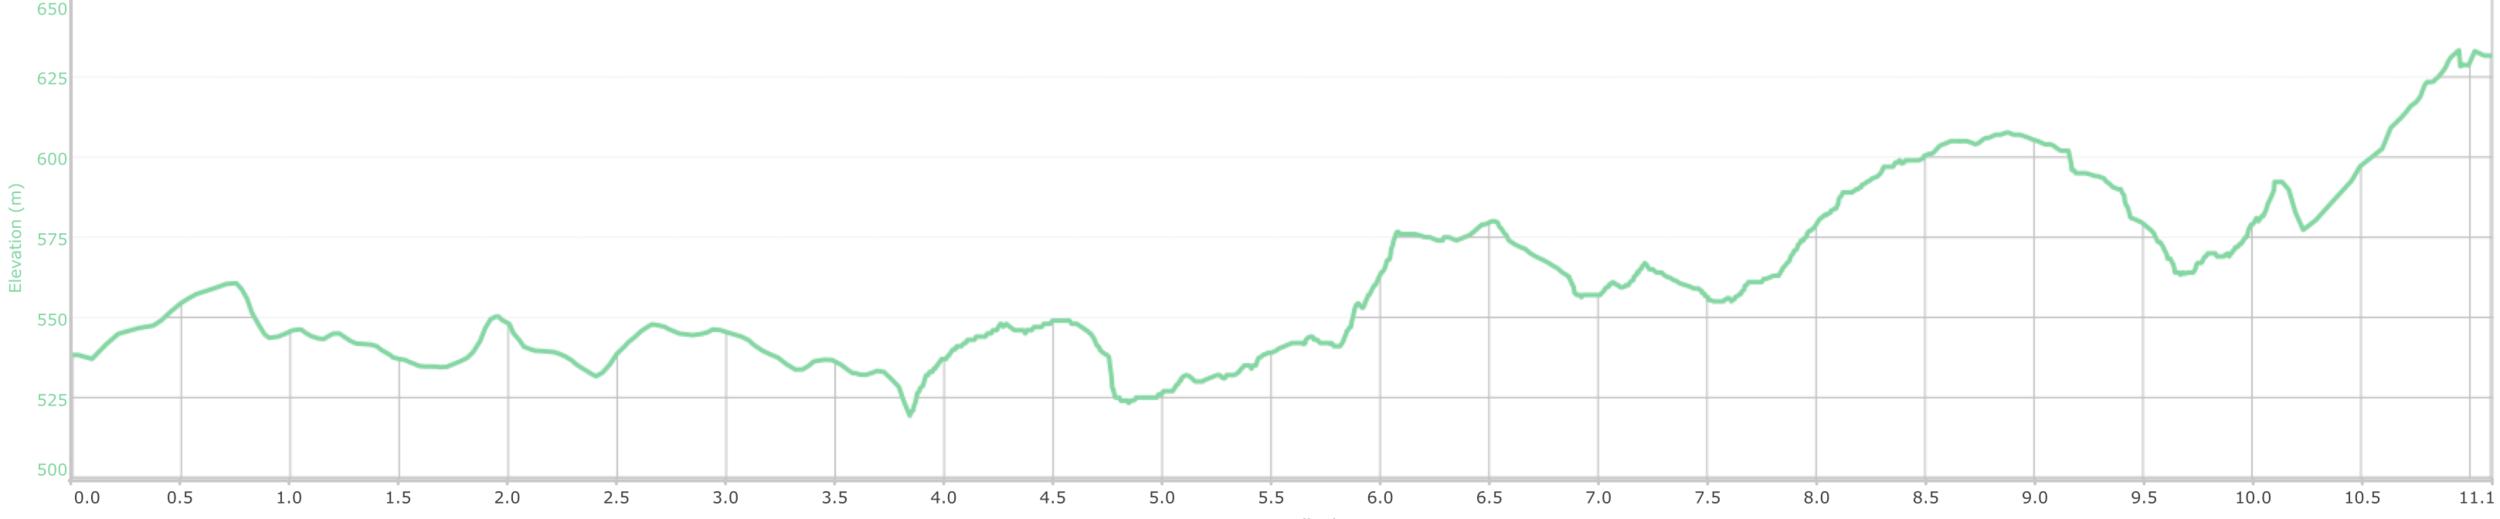 COURSE ELEVATION PROFILE - 13km